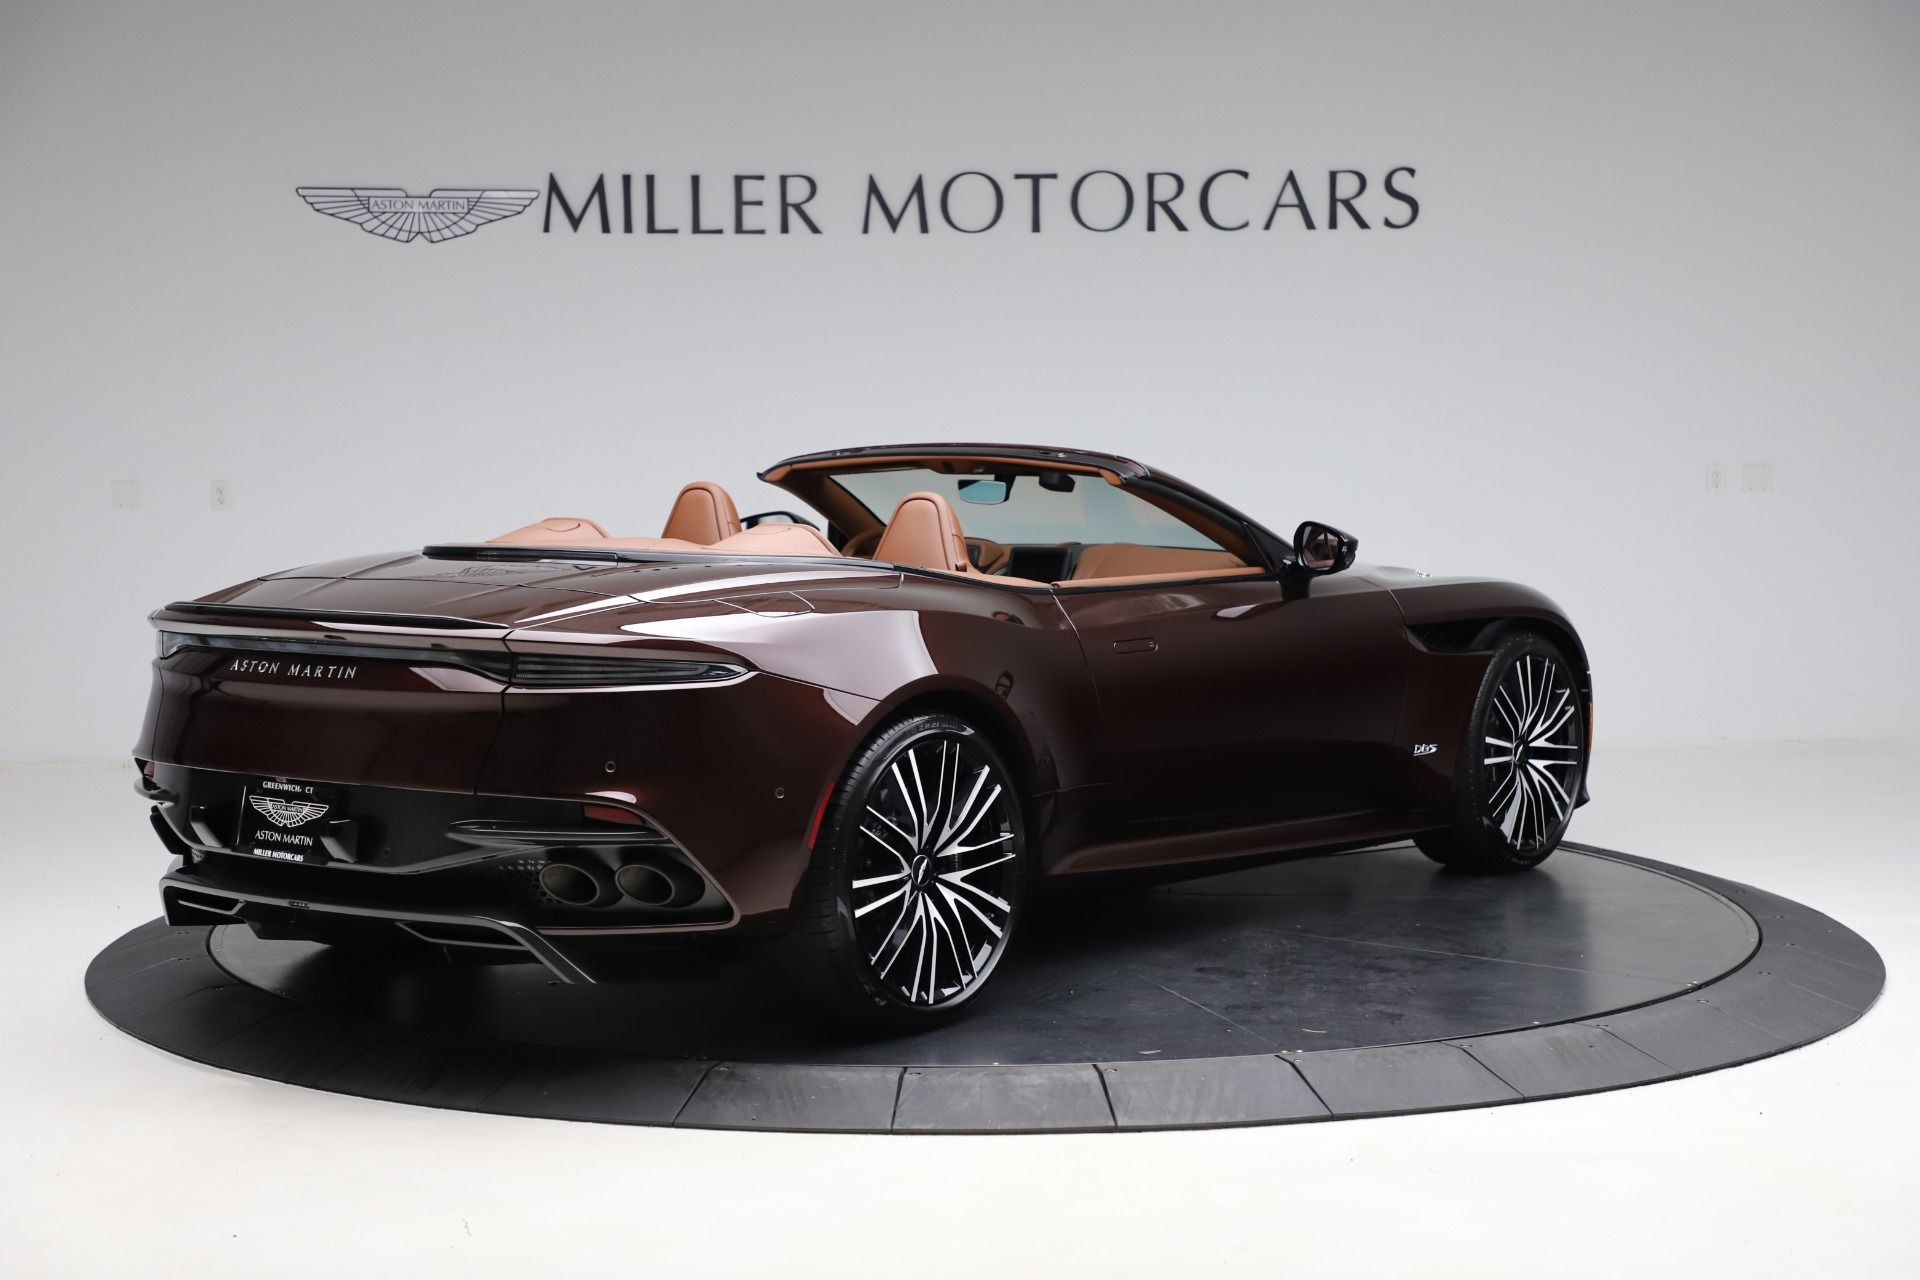 2020 Aston Martin Dbs Superleggera Volante Miller Motorcars United States For Sale On Luxurypulse Aston Martin Dbs Superleggera Aston Martin